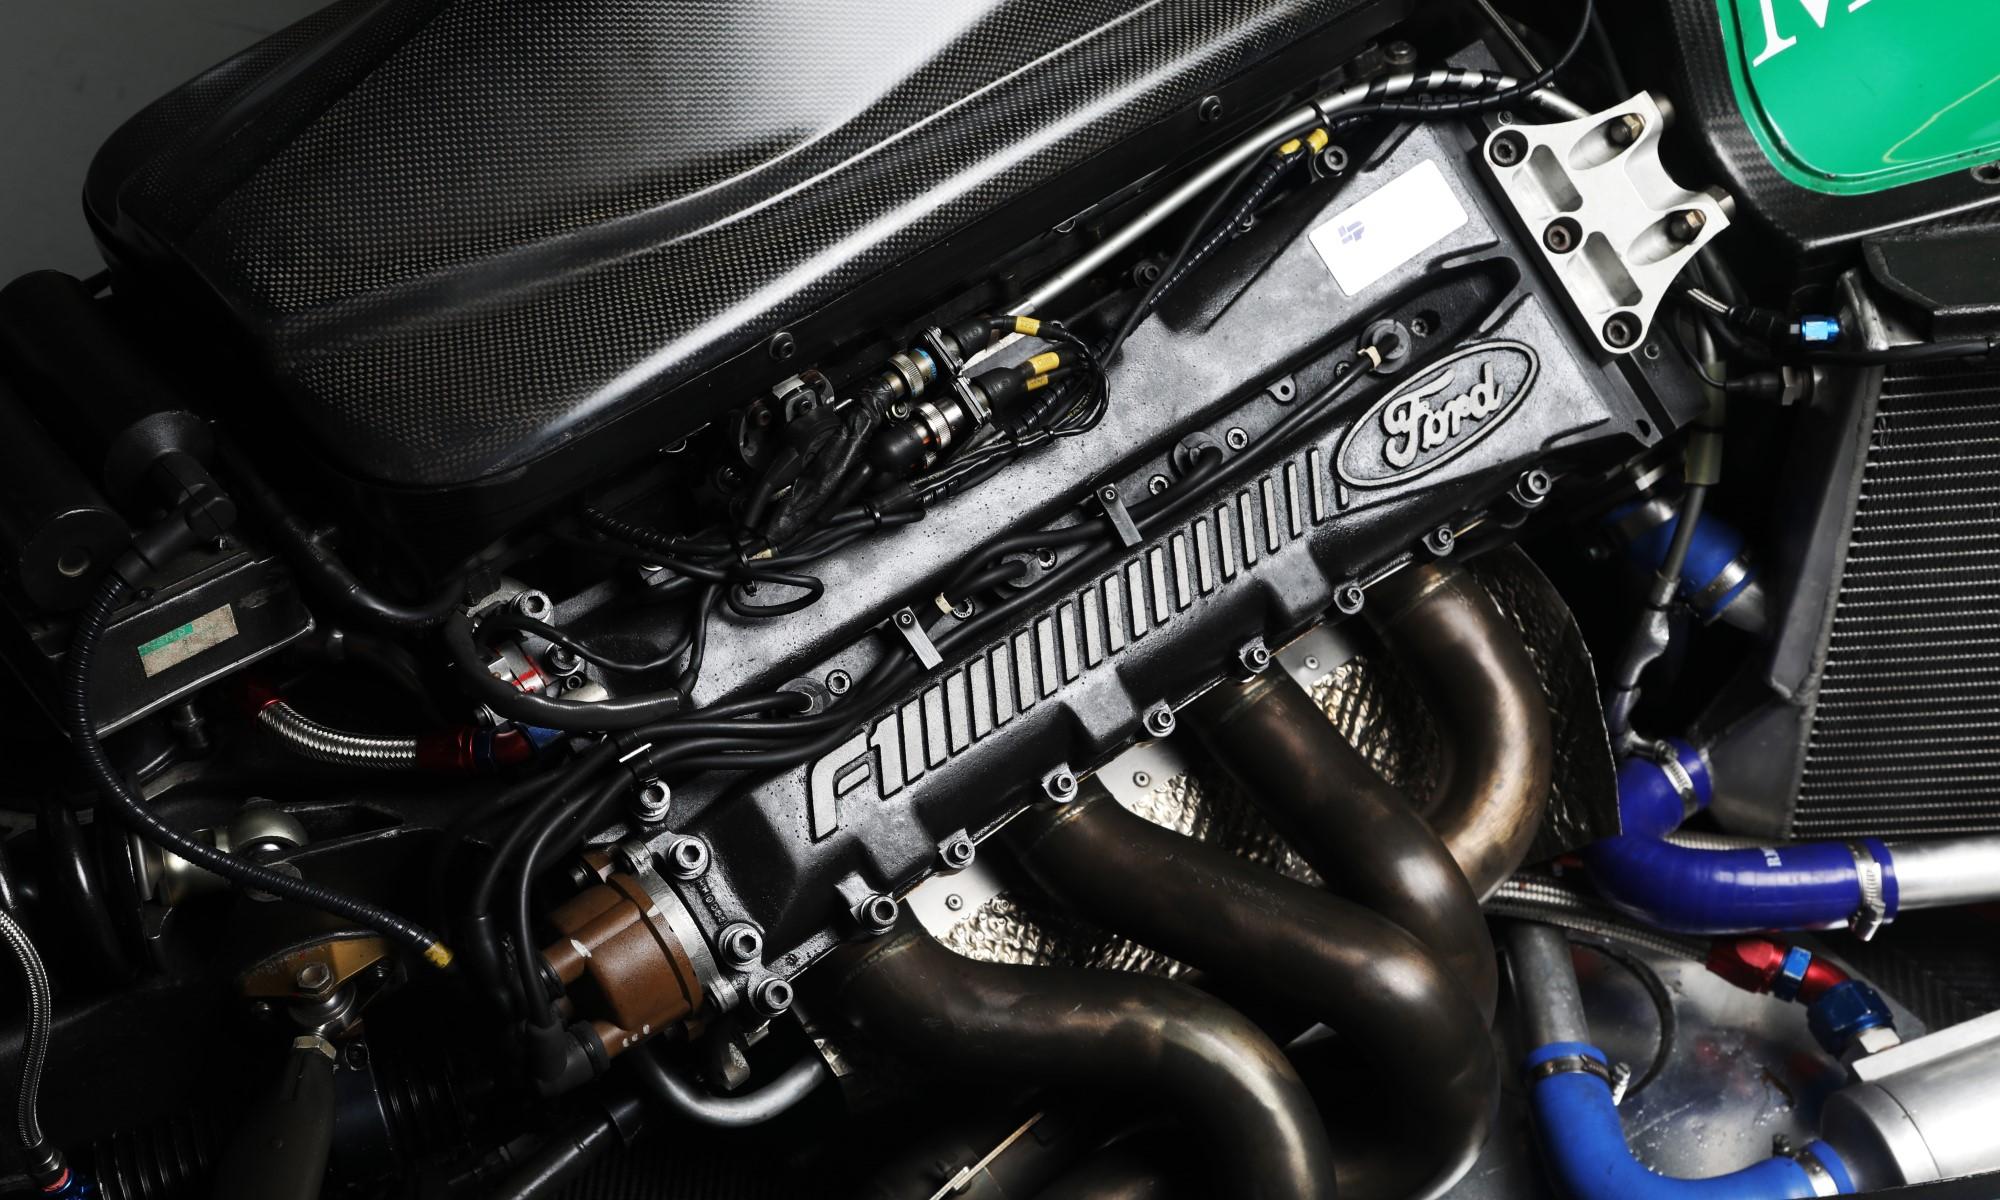 Schumacher Jordan F1 car engine